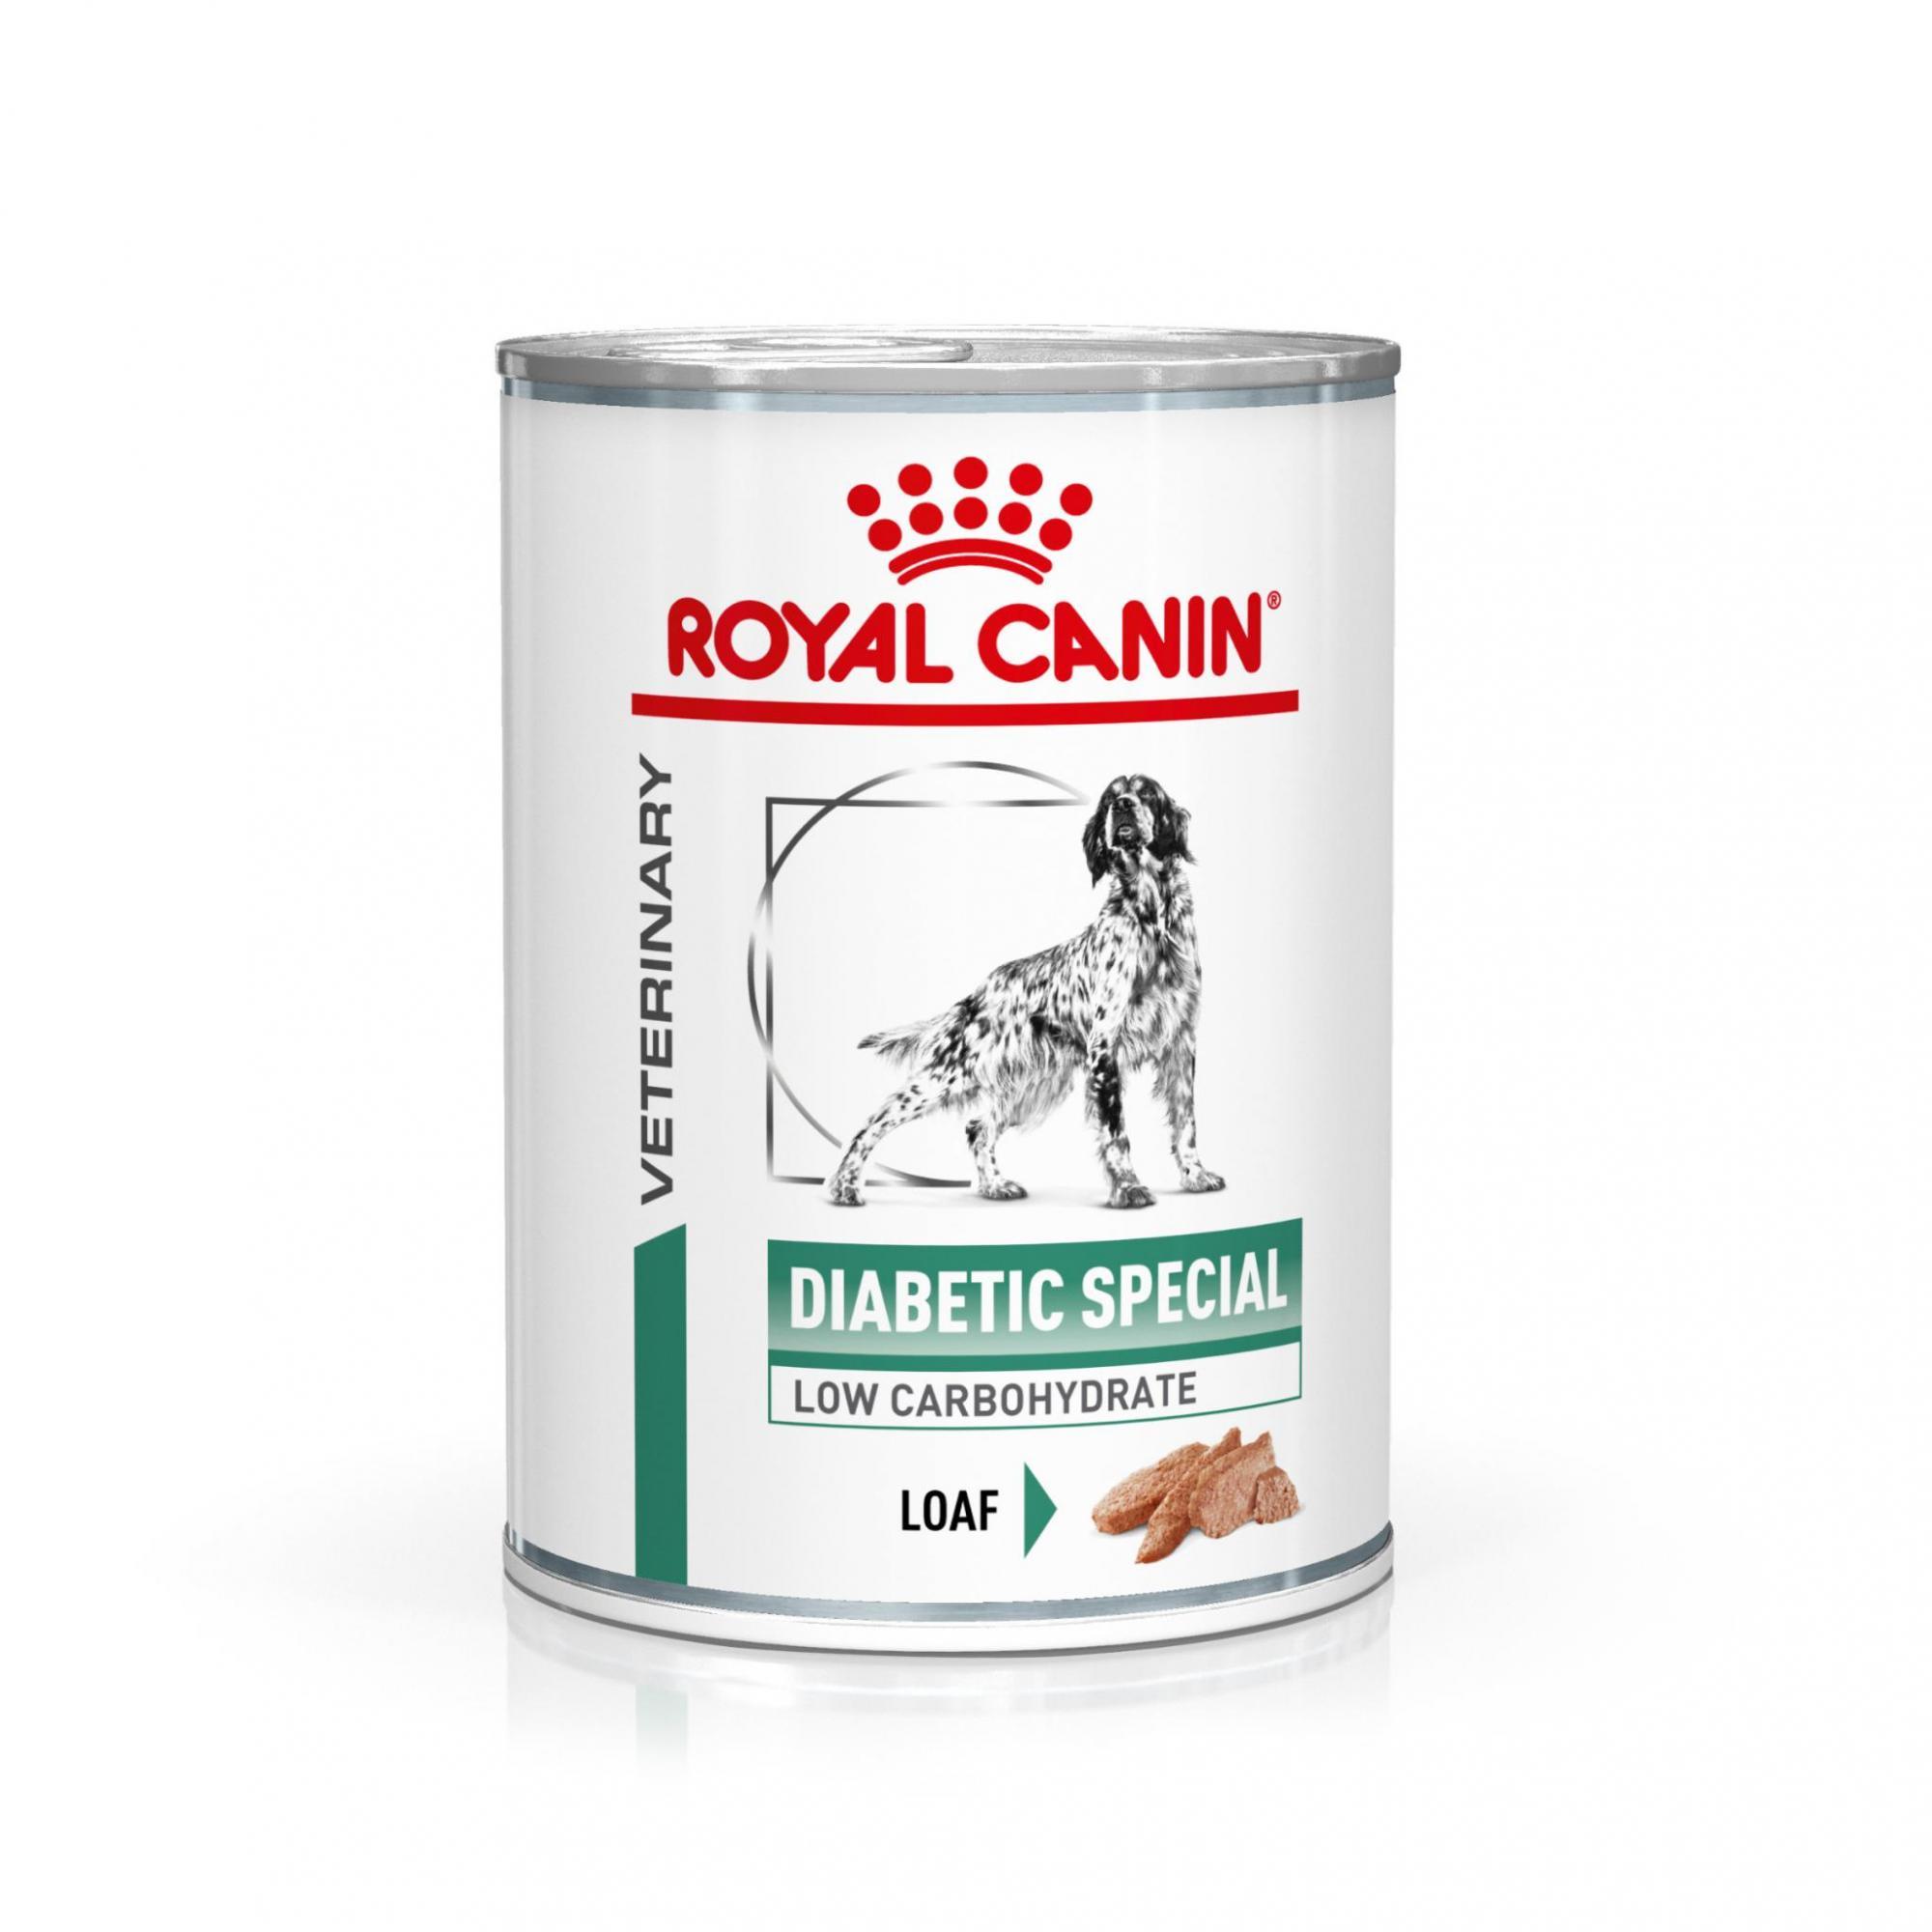 Royal Canin Veterinary Health Nutrition Dog DIABETIC konzerva 410g